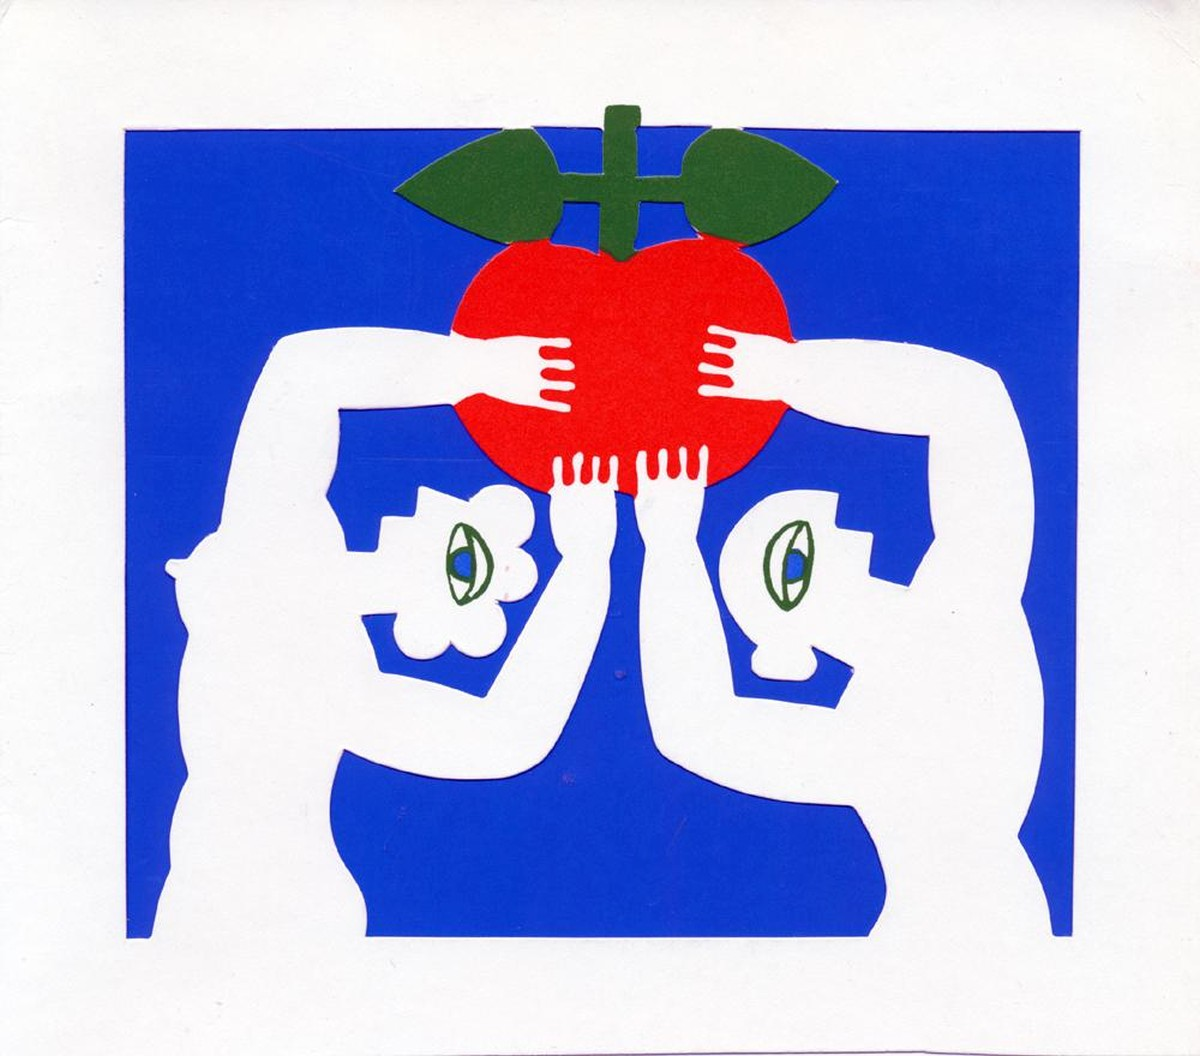 Herbert Schneider - Einladung Gunzenhauser 1975, Serigrafie kopen? Bied vanaf 30!